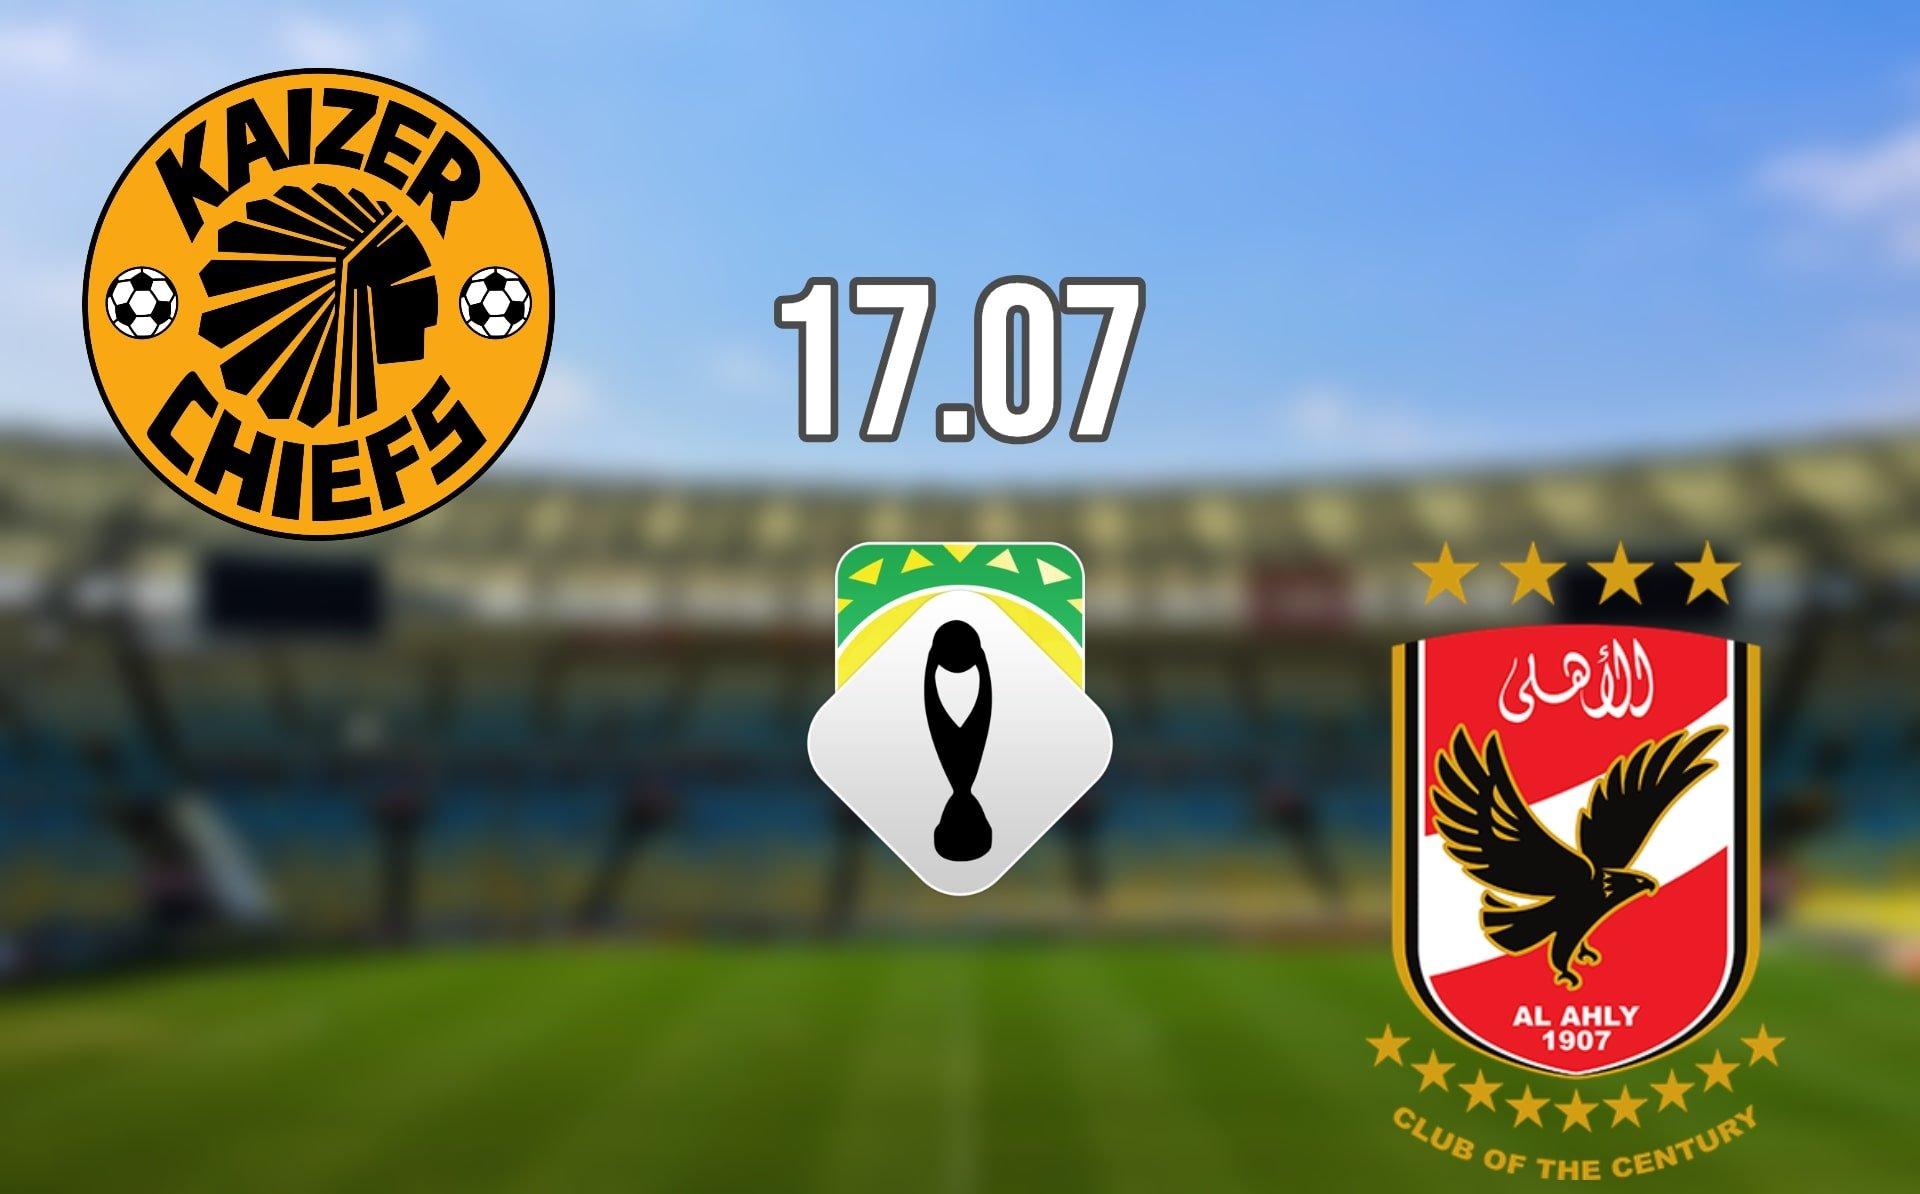 Kaizer Chiefs vs Al Ahly Prediction: CAF Champions League Final on 17.07.2021